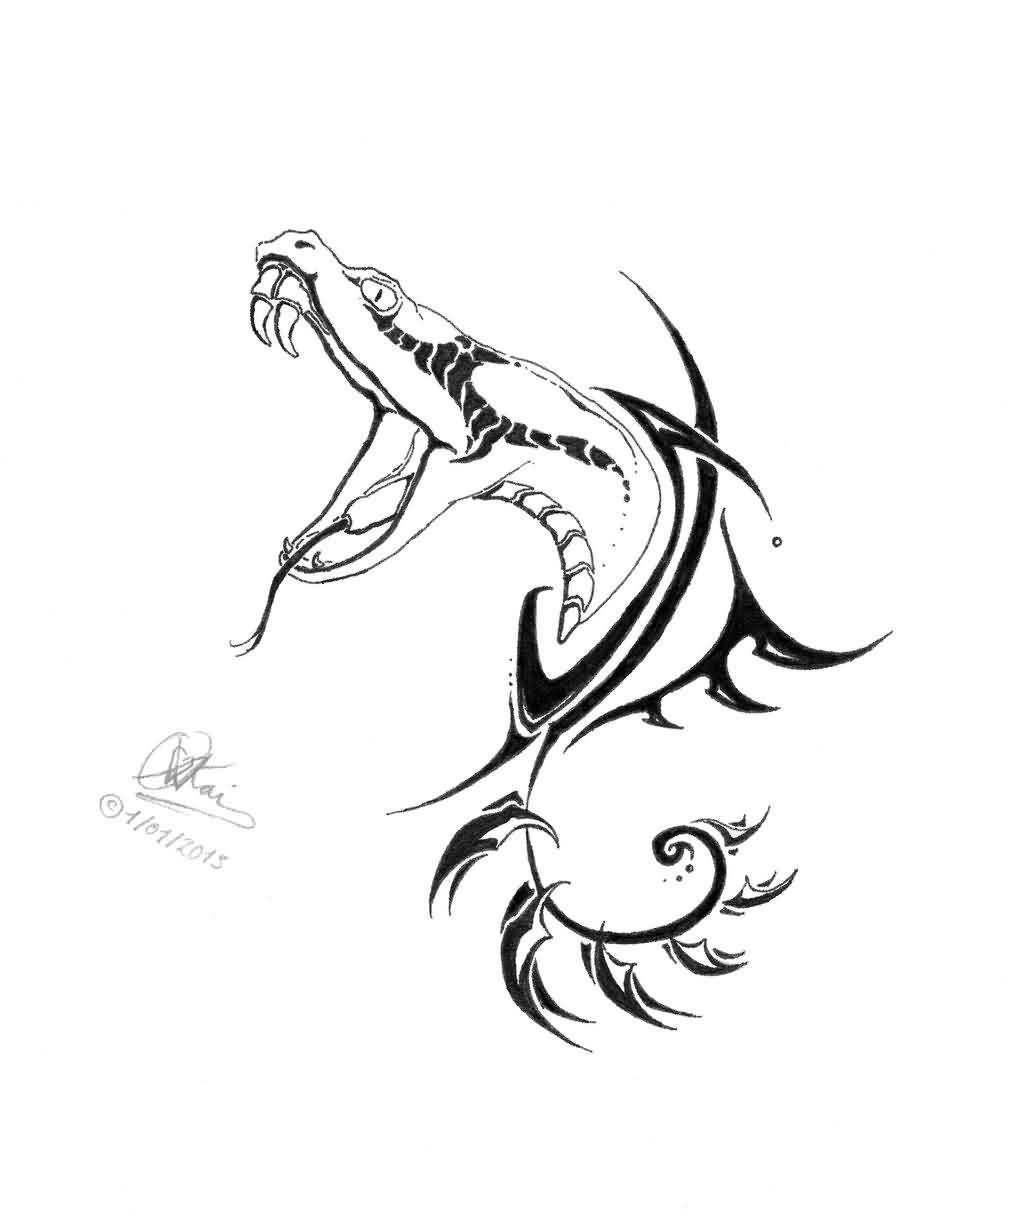 Drawn snake angry snake  A Tattoobite Dagger com